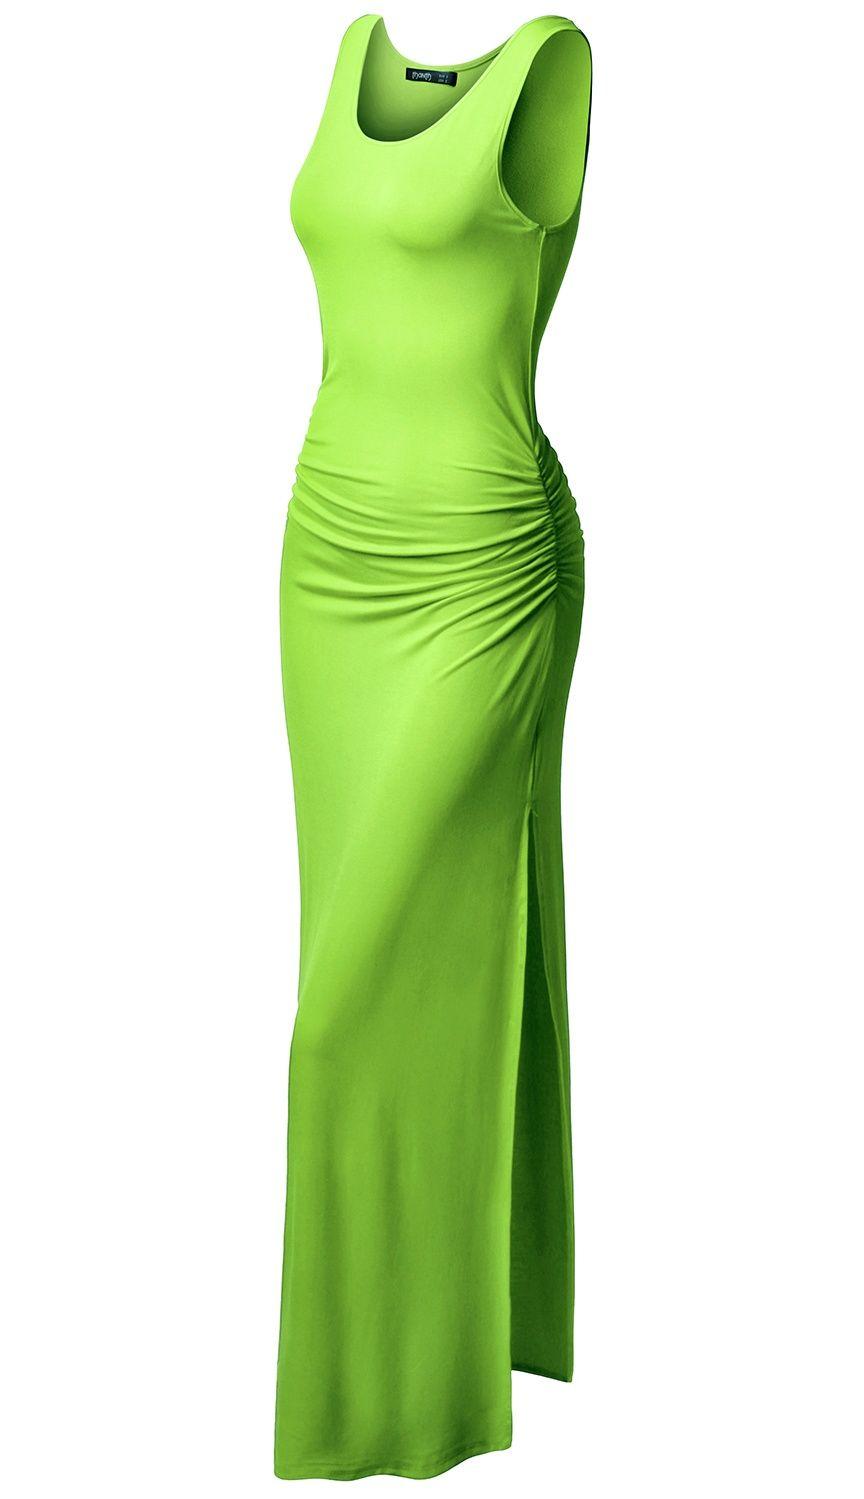 Doublju Doublju Women S High Split Bodycon Side Shirring Waist Sleeveless Maxi Dress Lime L Walmart Com Maxi Dress Party Womens Maxi Dresses Plus Size Maxi Dresses [ 1499 x 864 Pixel ]